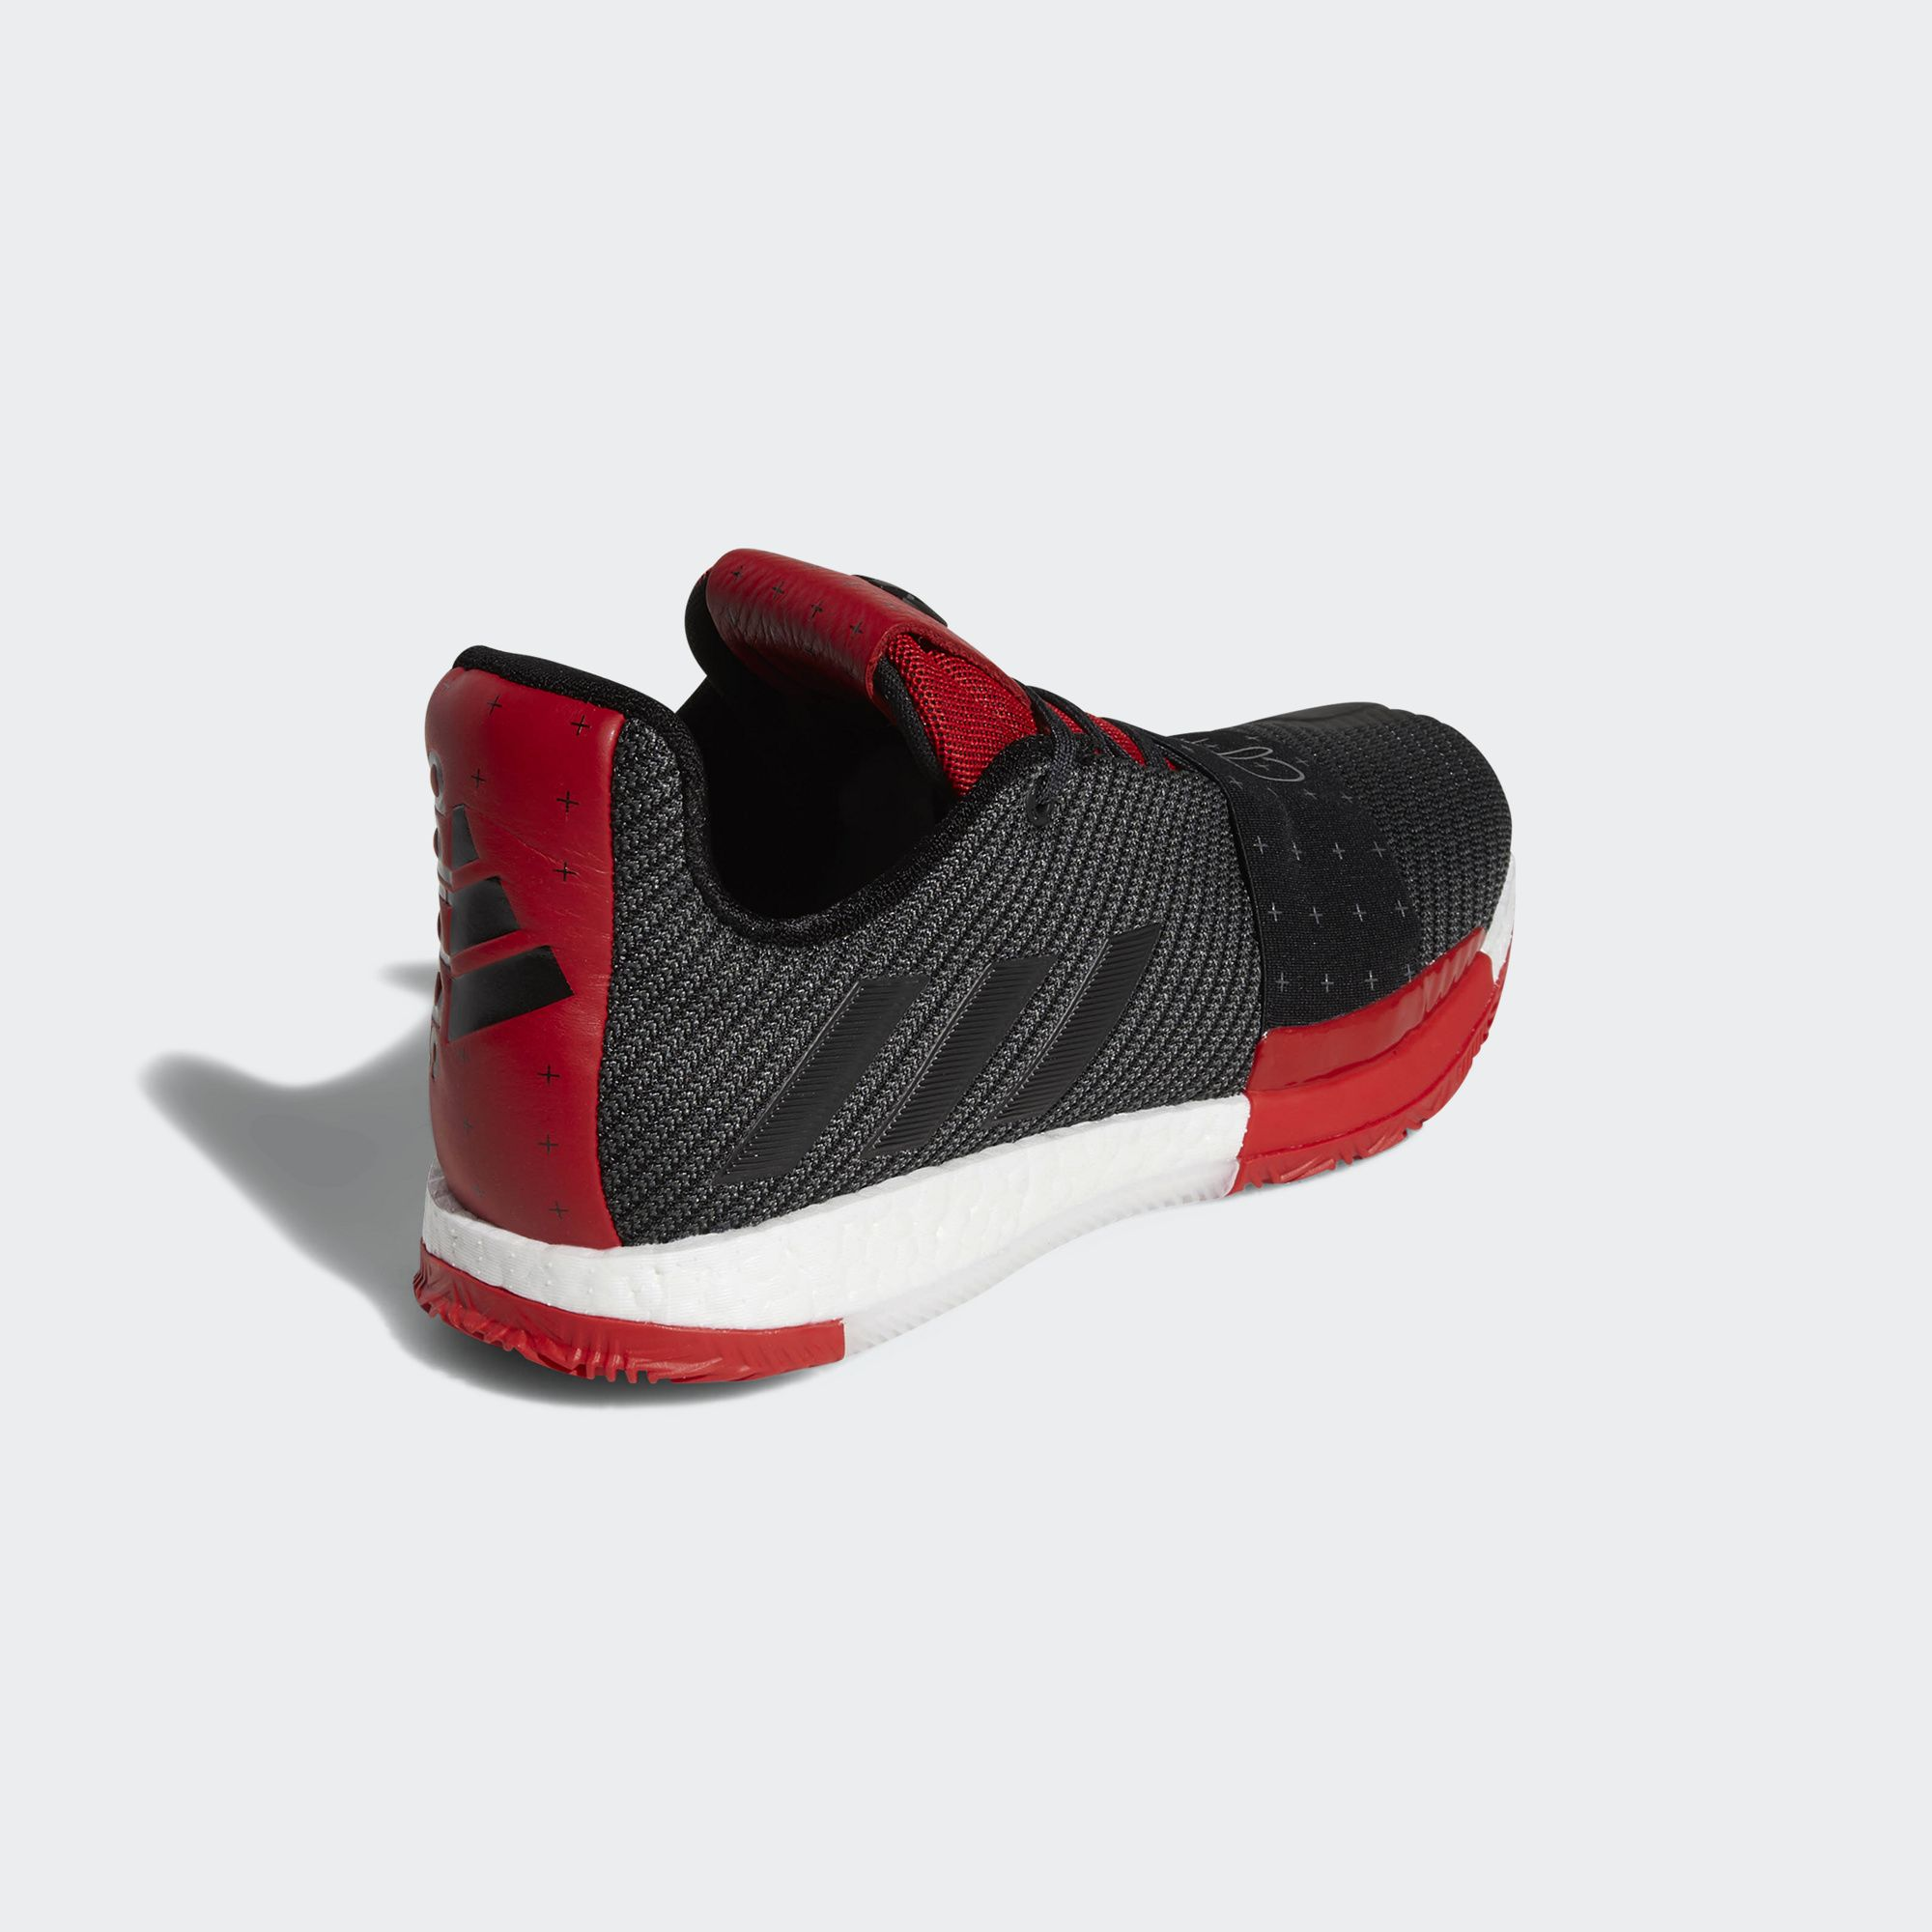 adidas harden vol 3 black red 4